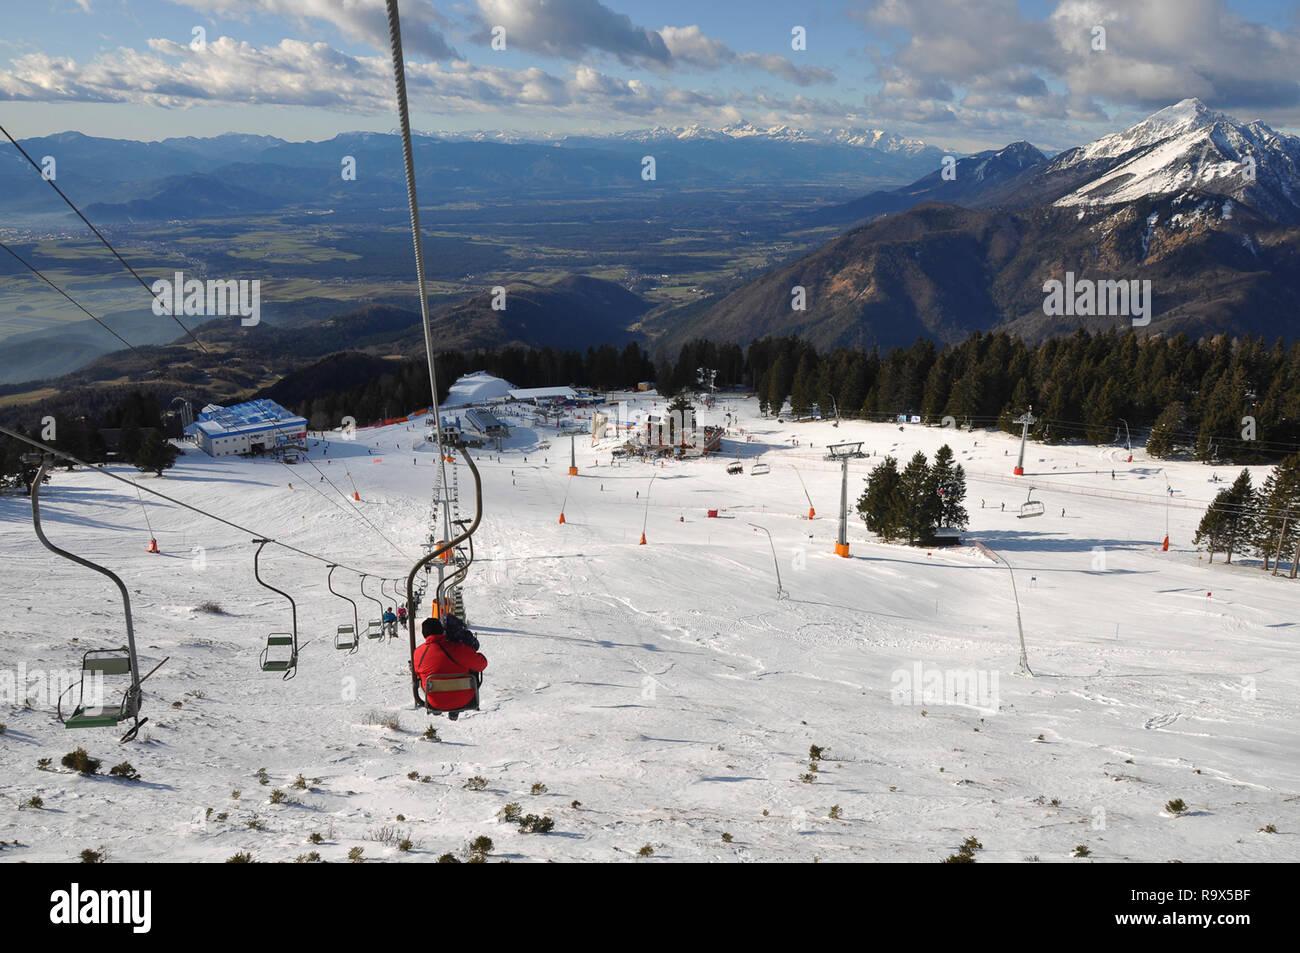 people riding a skilift at krvavec alpine mountain ski resort in